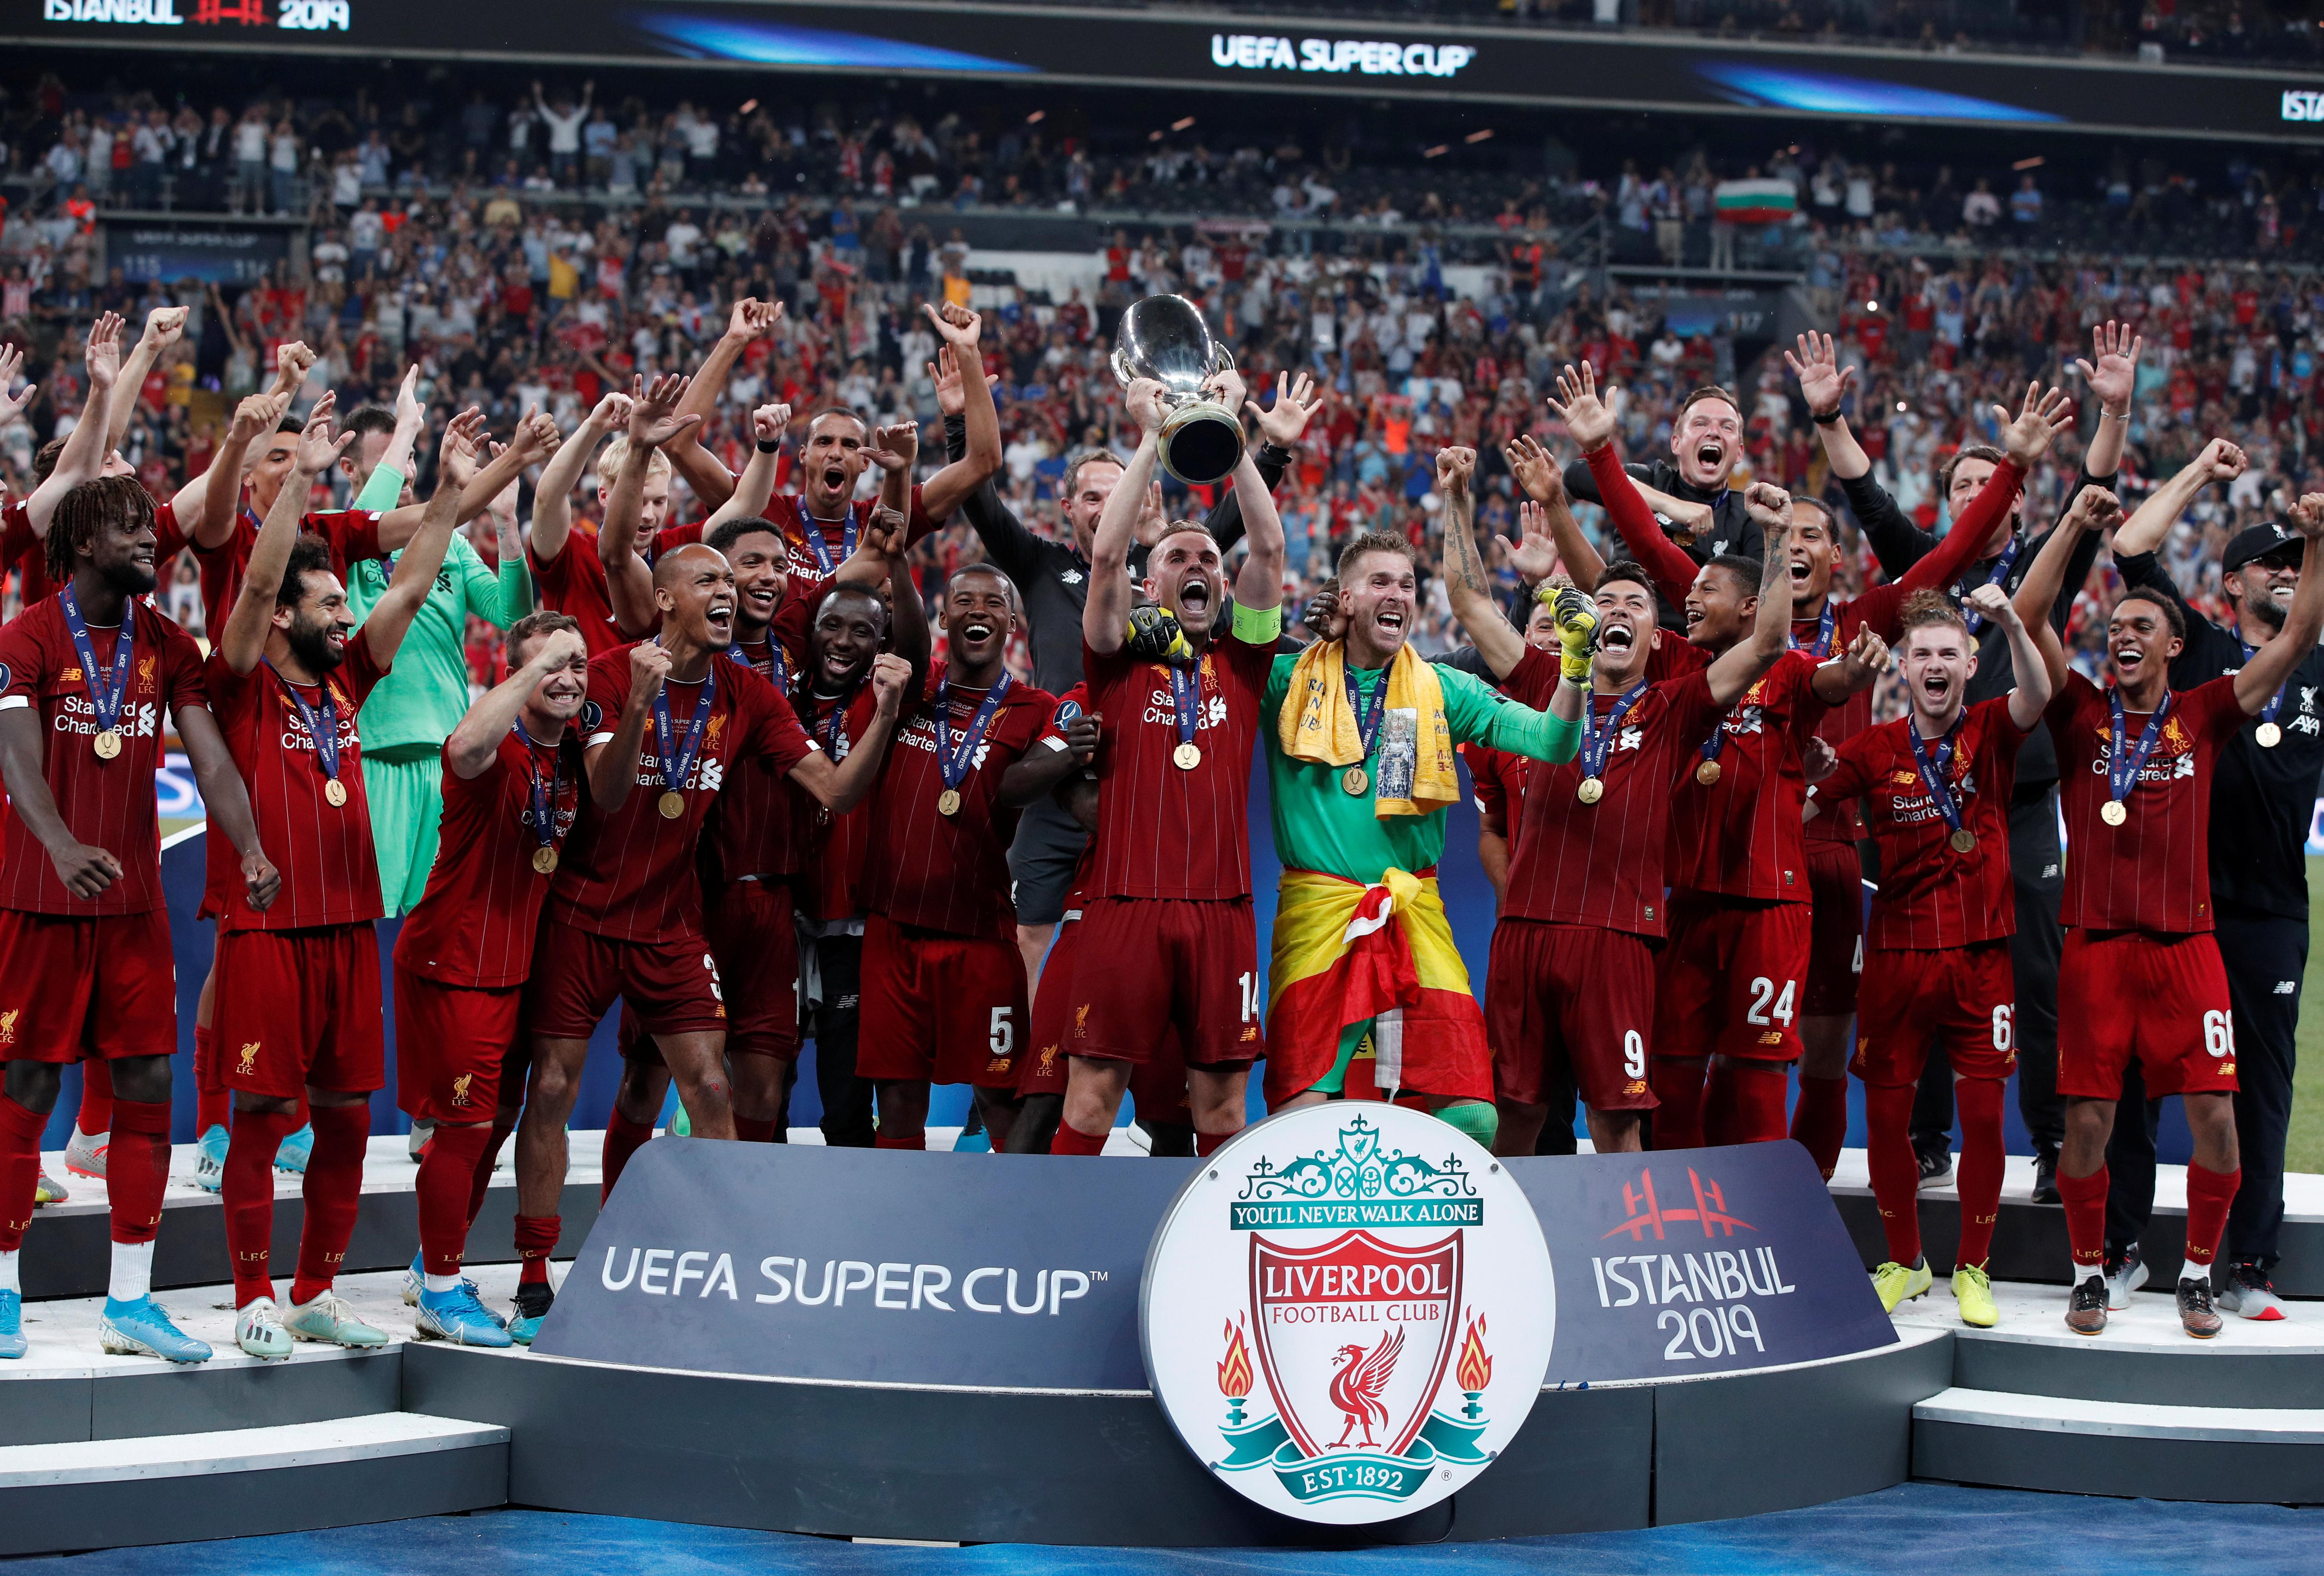 Championsl